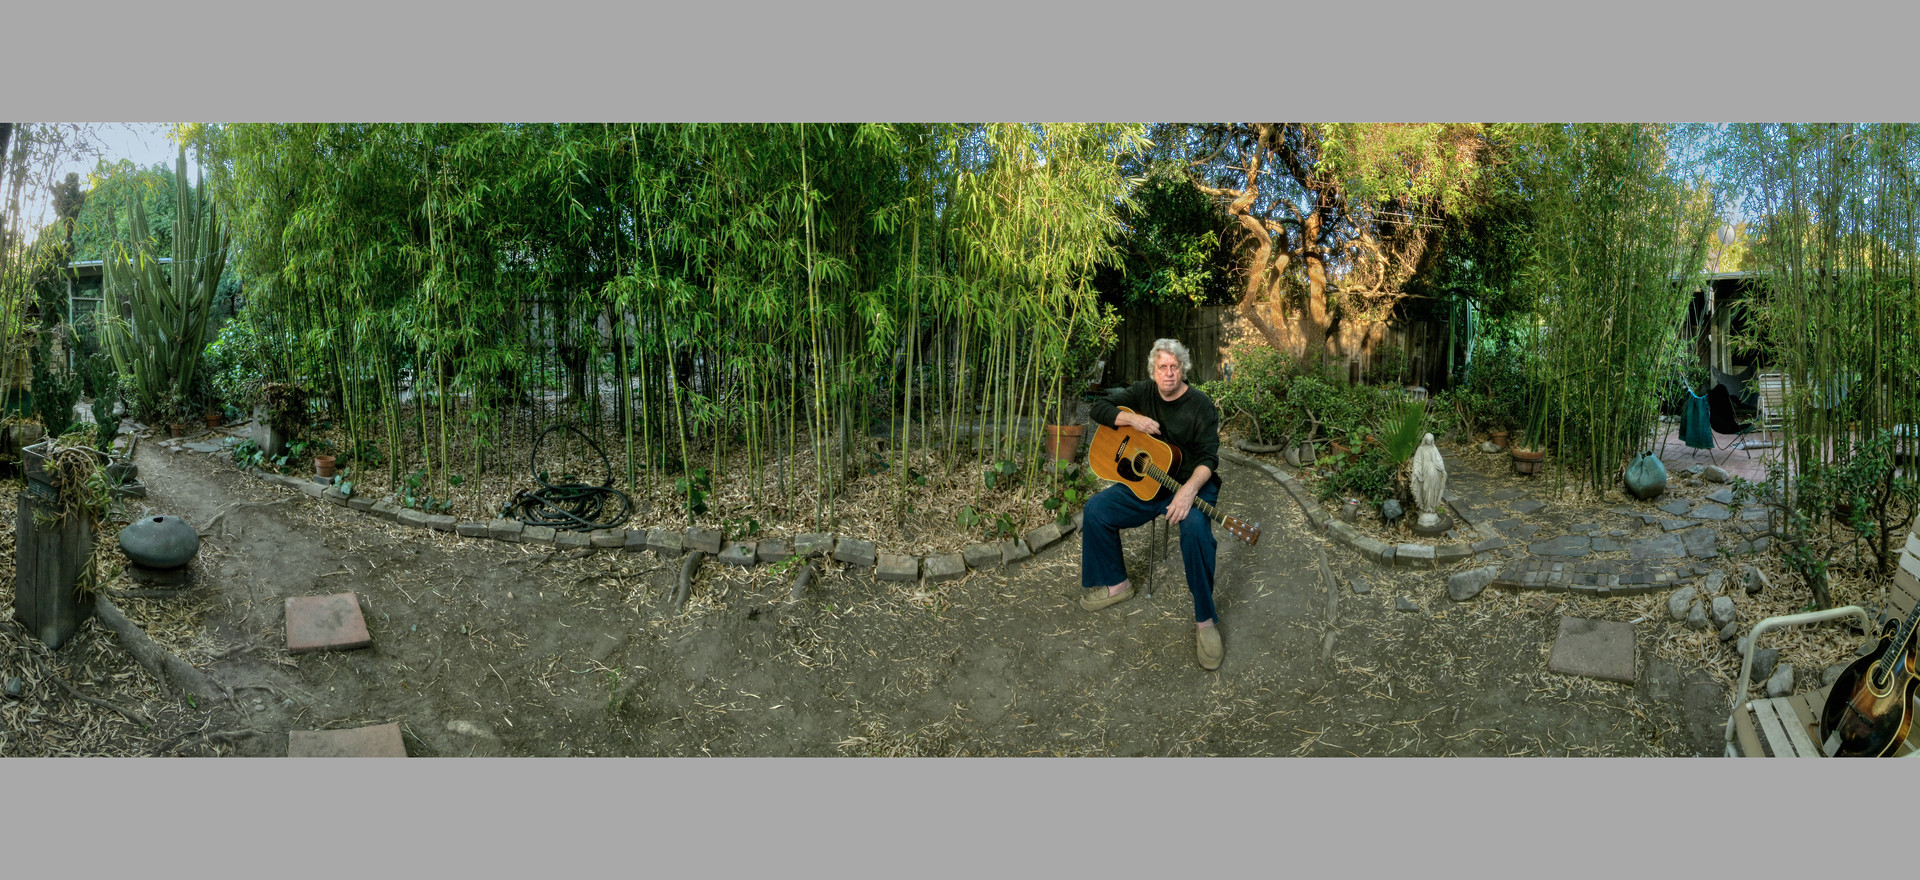 Chris Darrow's bamboo forest, 2007